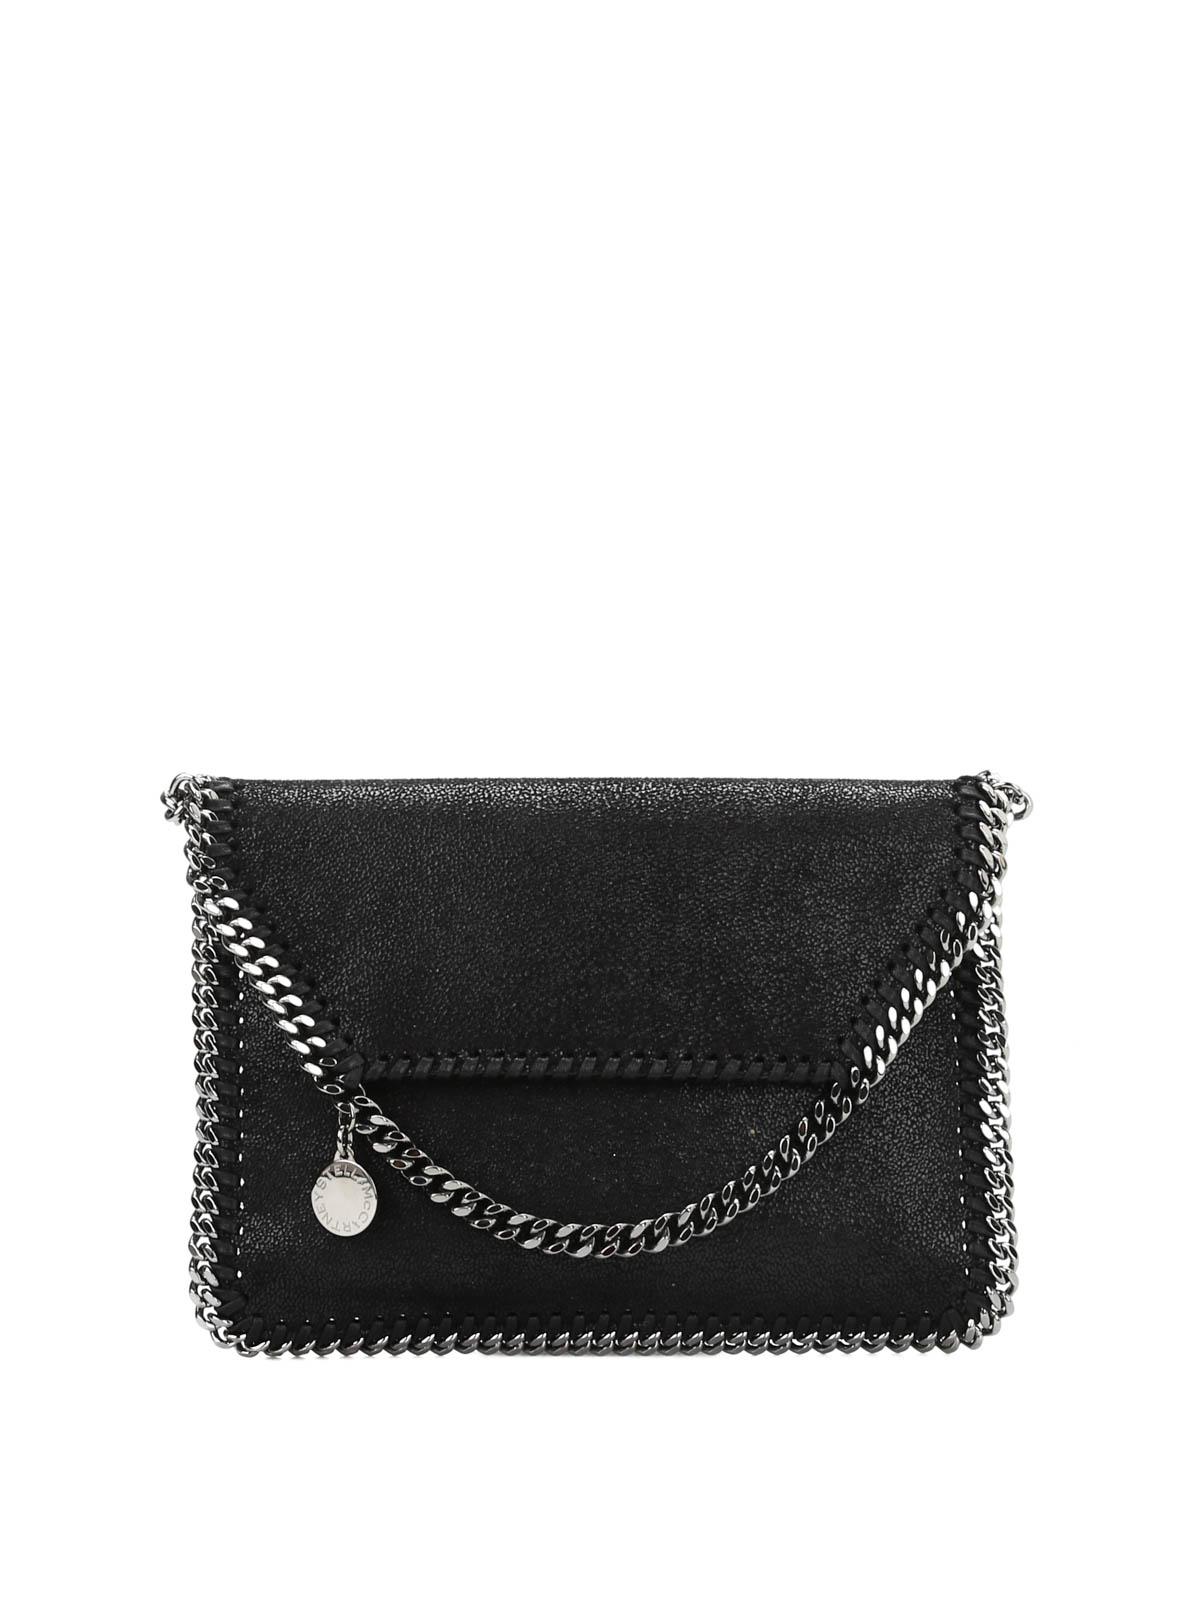 stella mccartney chain crossbody bag cross body bags 349448 w9132 1000. Black Bedroom Furniture Sets. Home Design Ideas